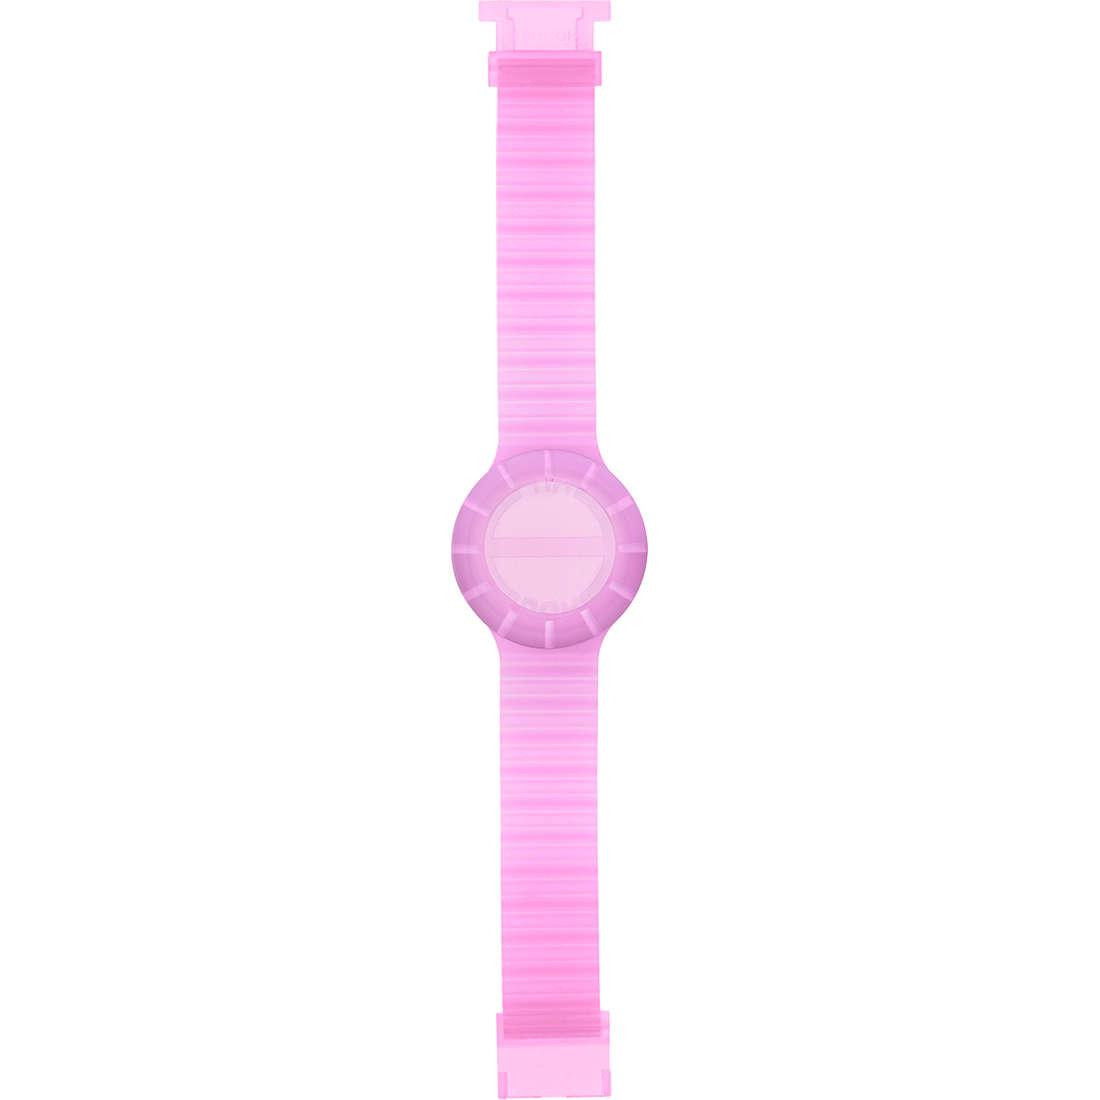 orologio accessorio unisex Hip Hop HBU0097